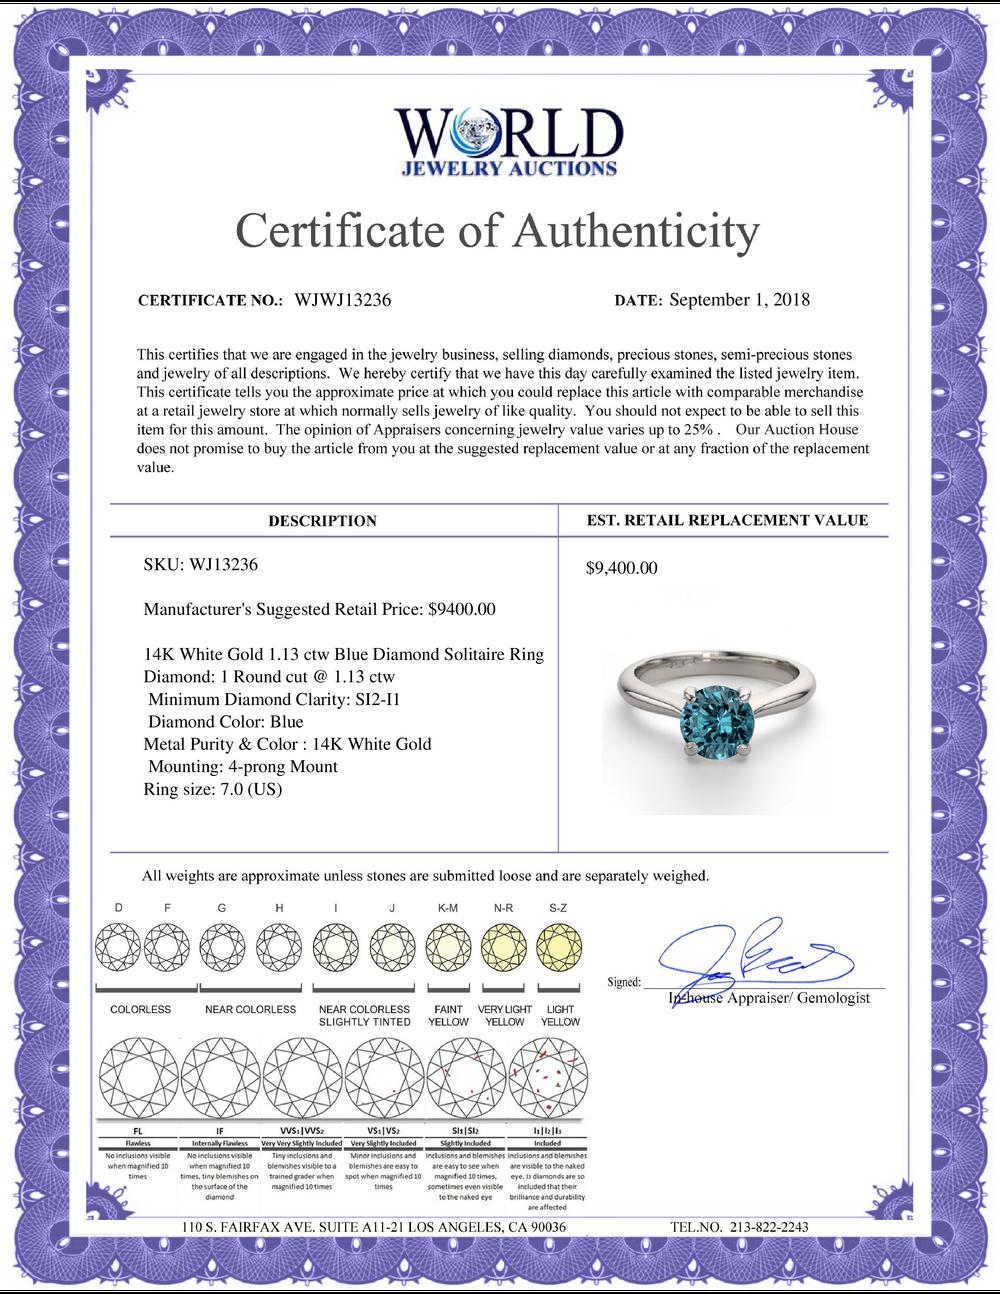 Lot 4147: 14K White Gold 1.13 ctw Blue Diamond Solitaire Ring - REF-183Y6X-WJ13236